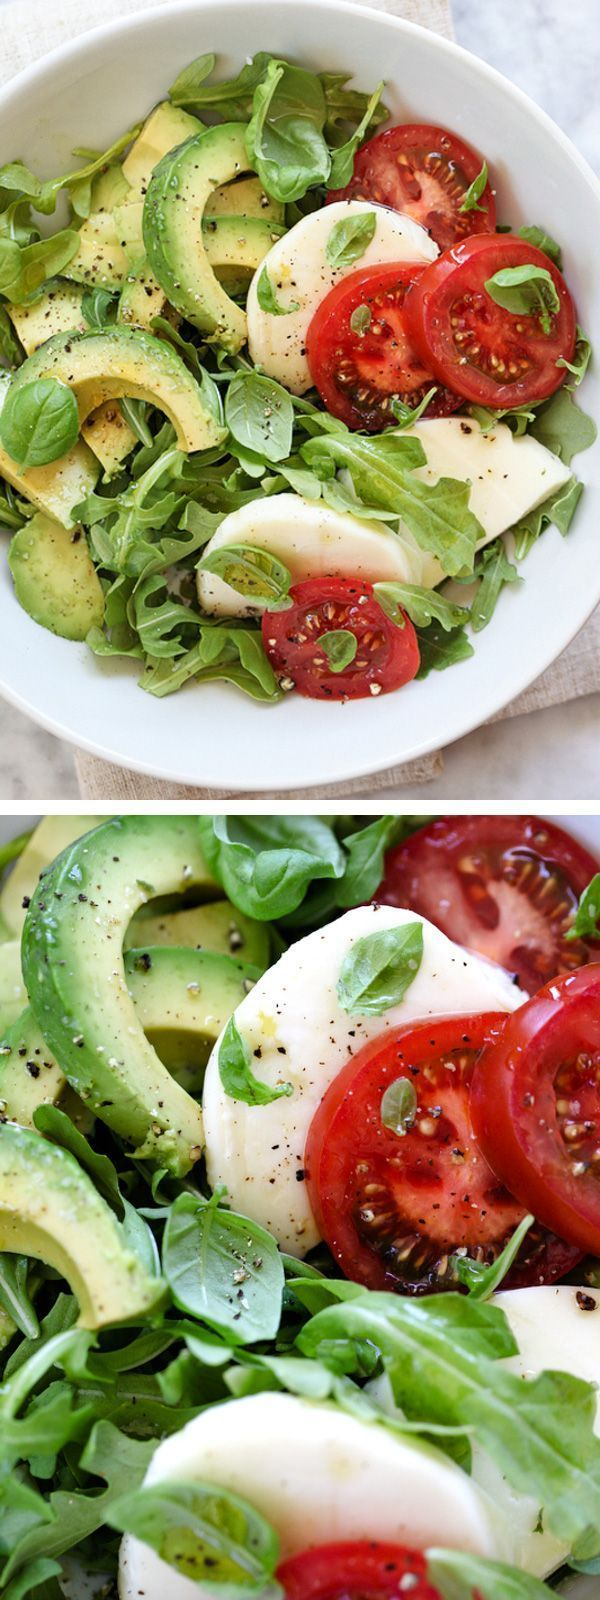 Great Summer Salad!